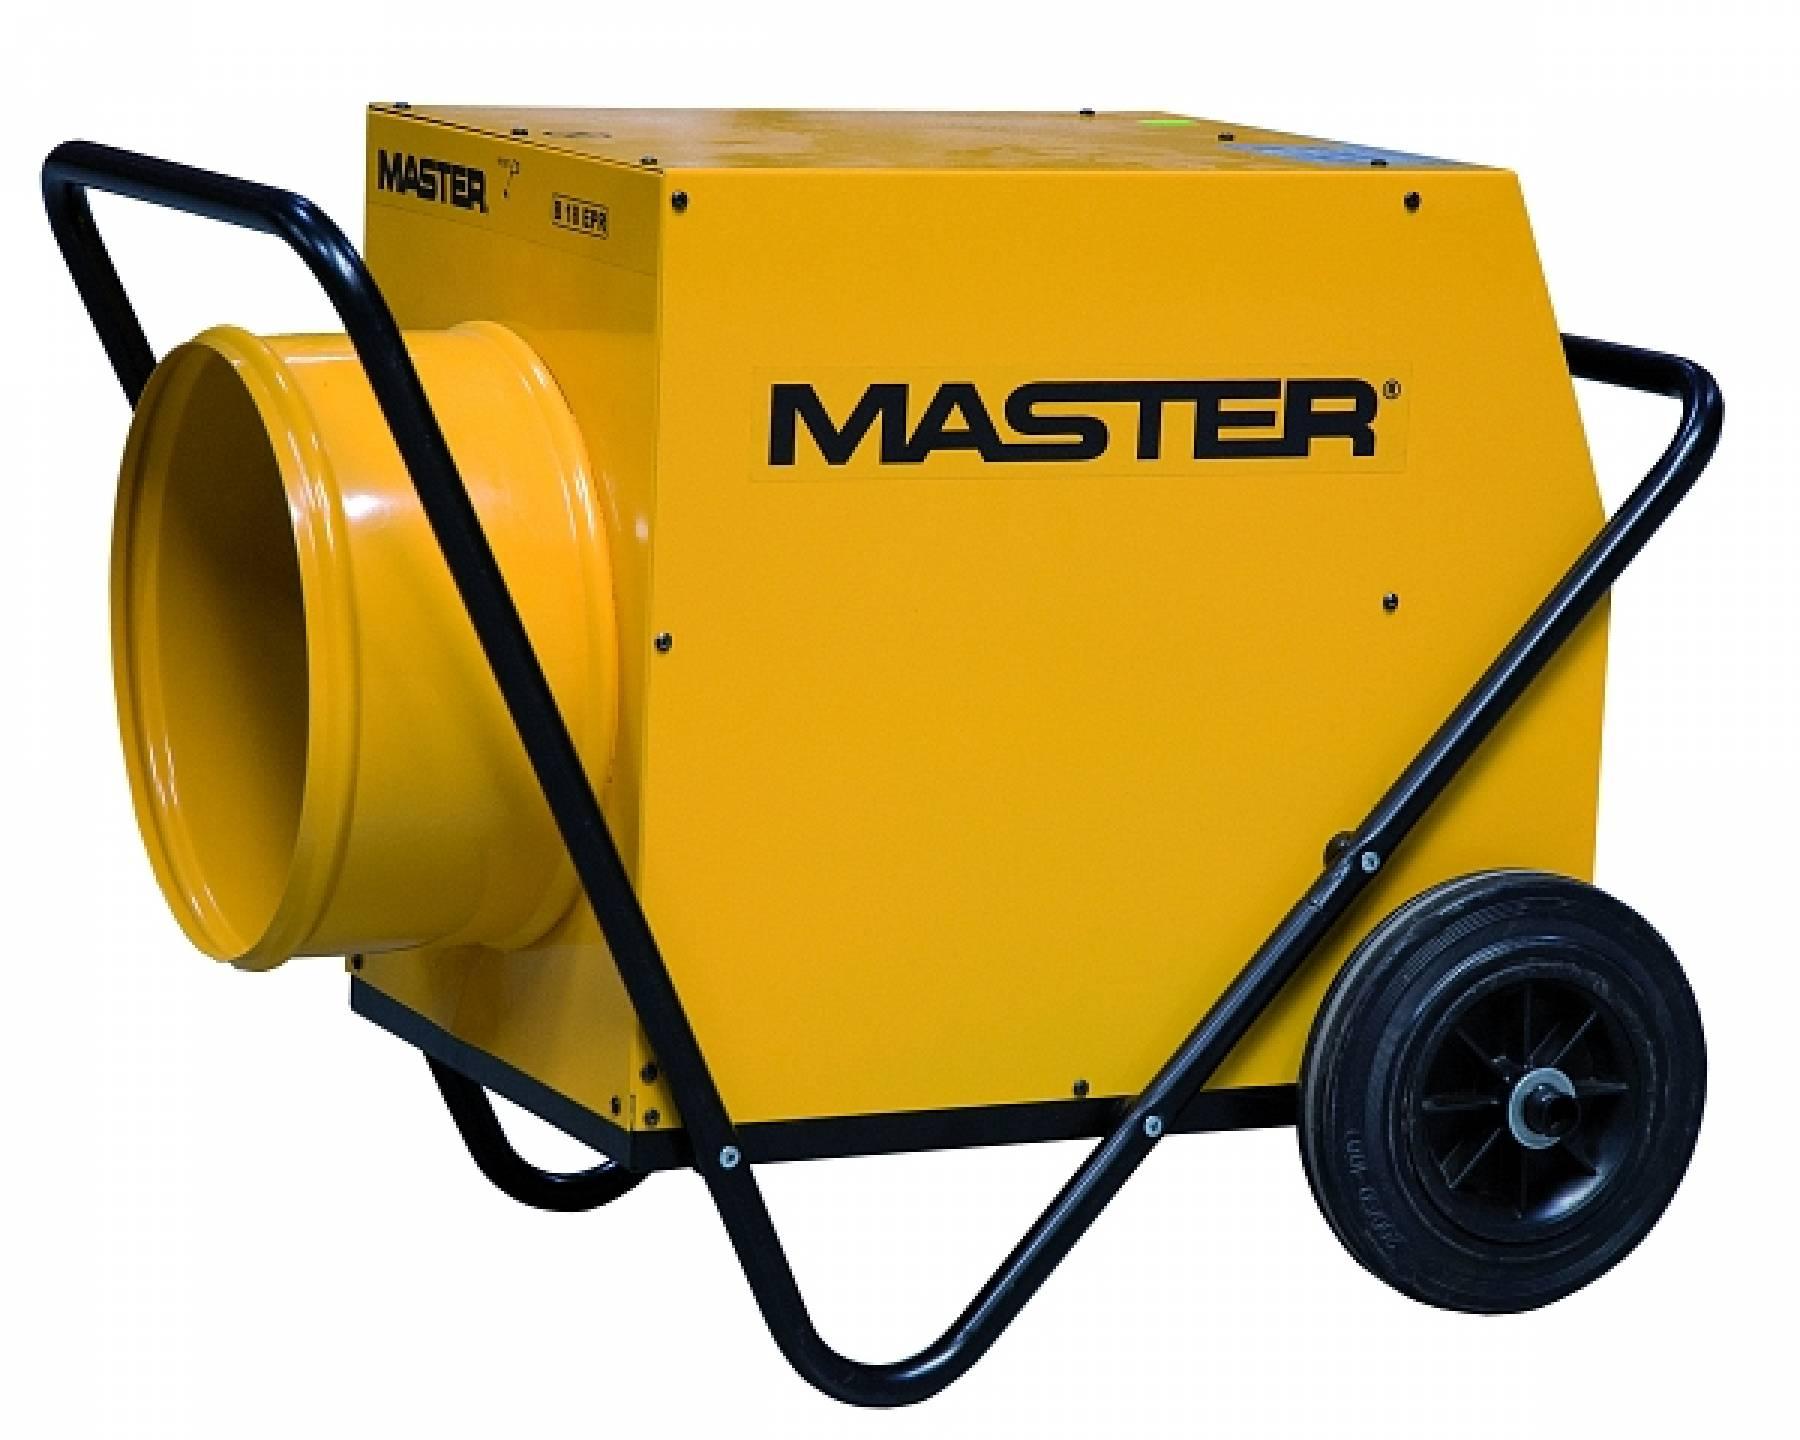 Master B 18 EPR Elektrické topidlo